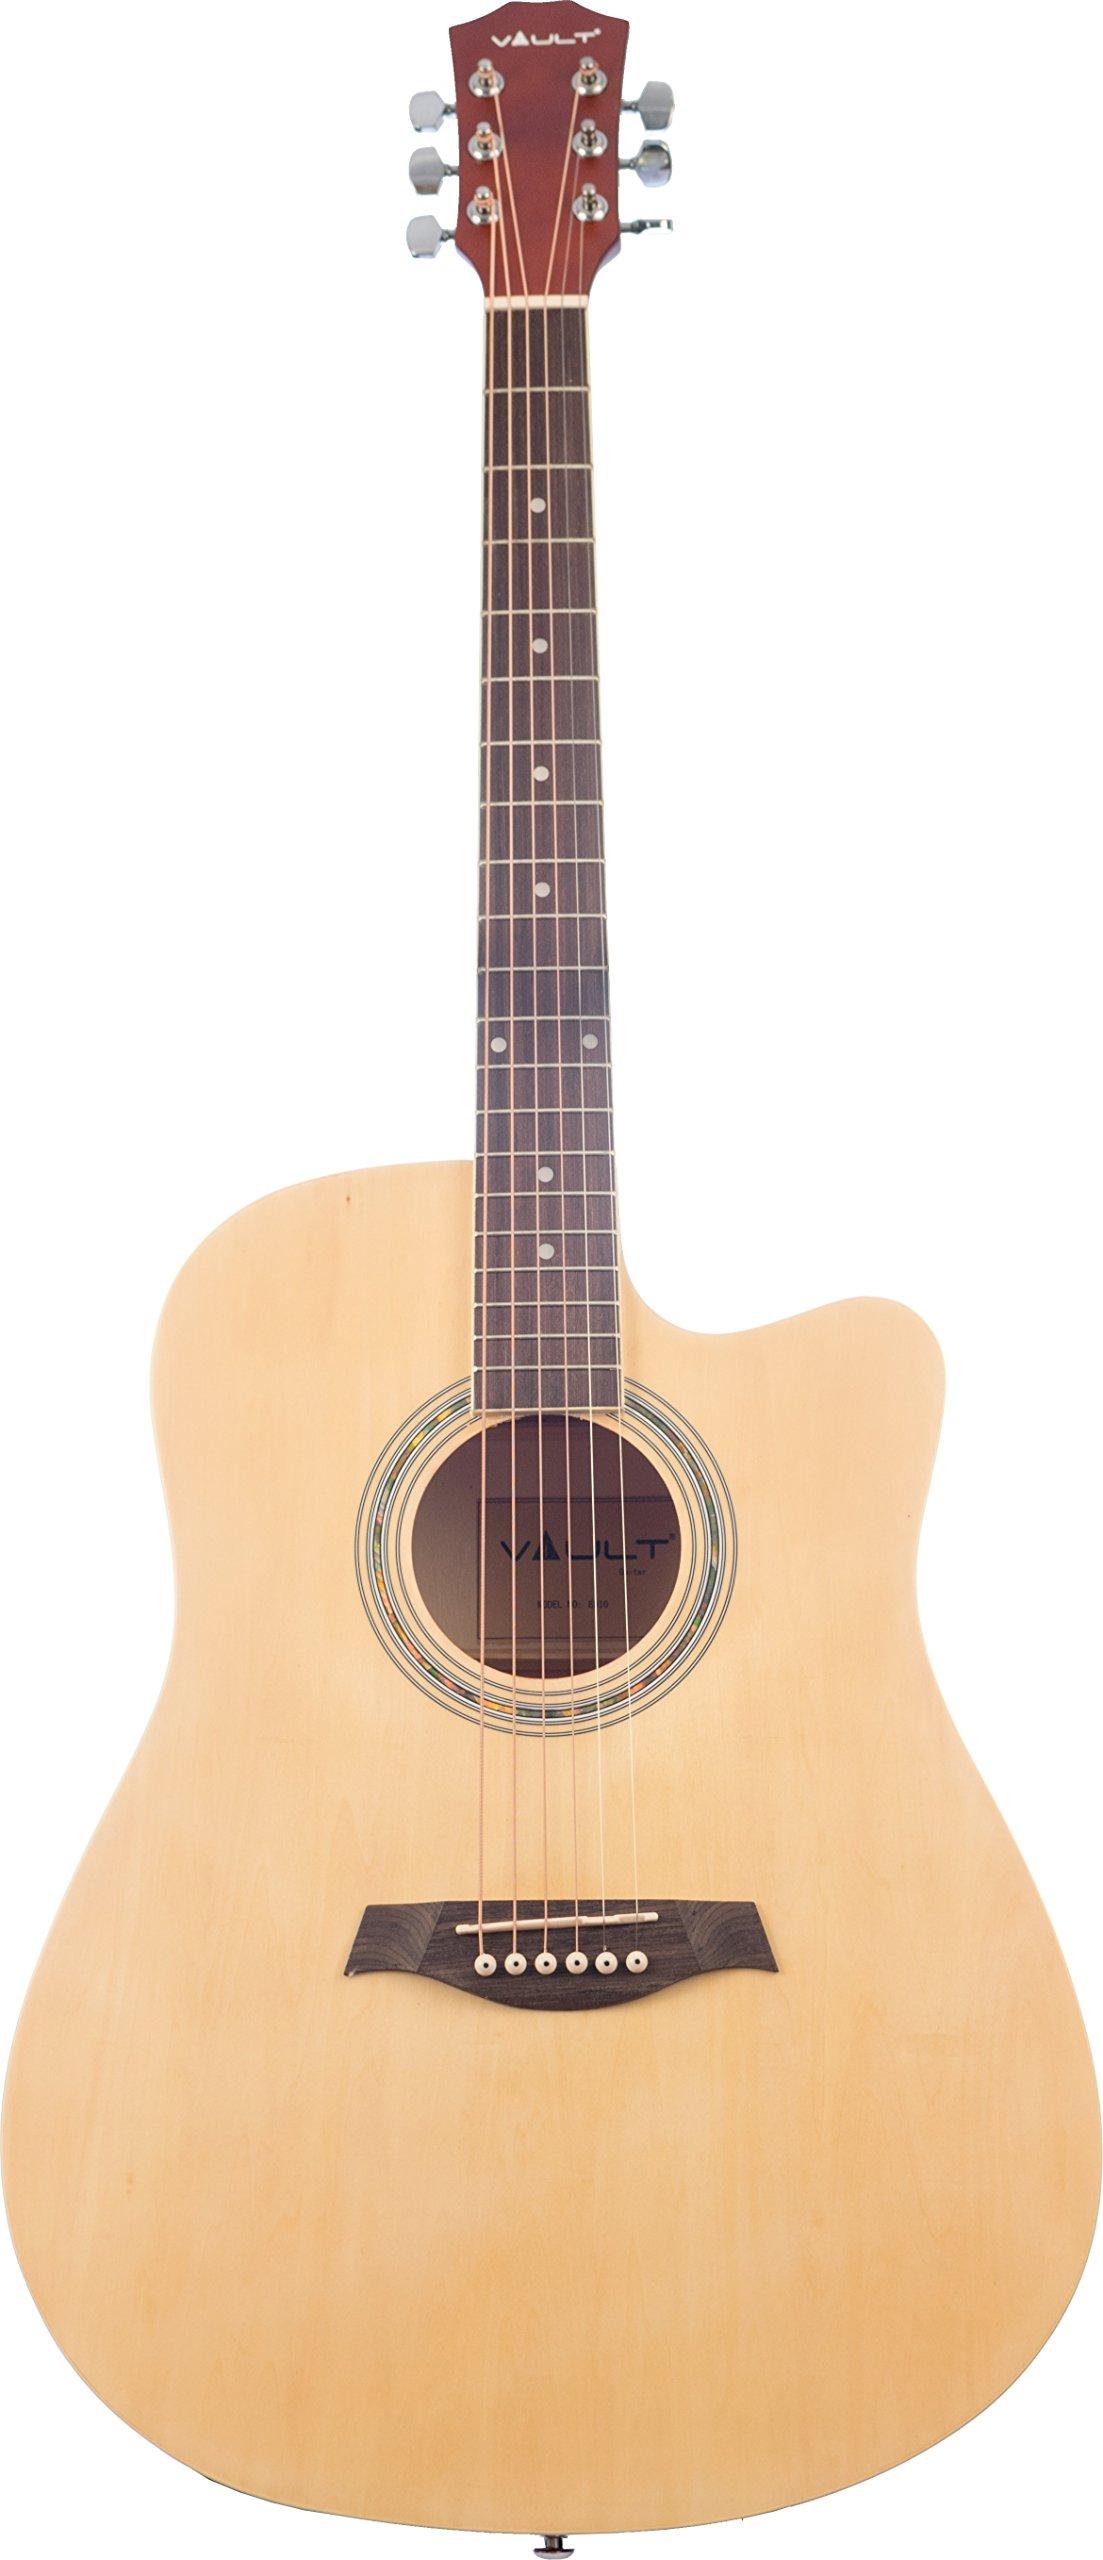 Vault ED-10C Cutaway Acoustic Guitar - Natural